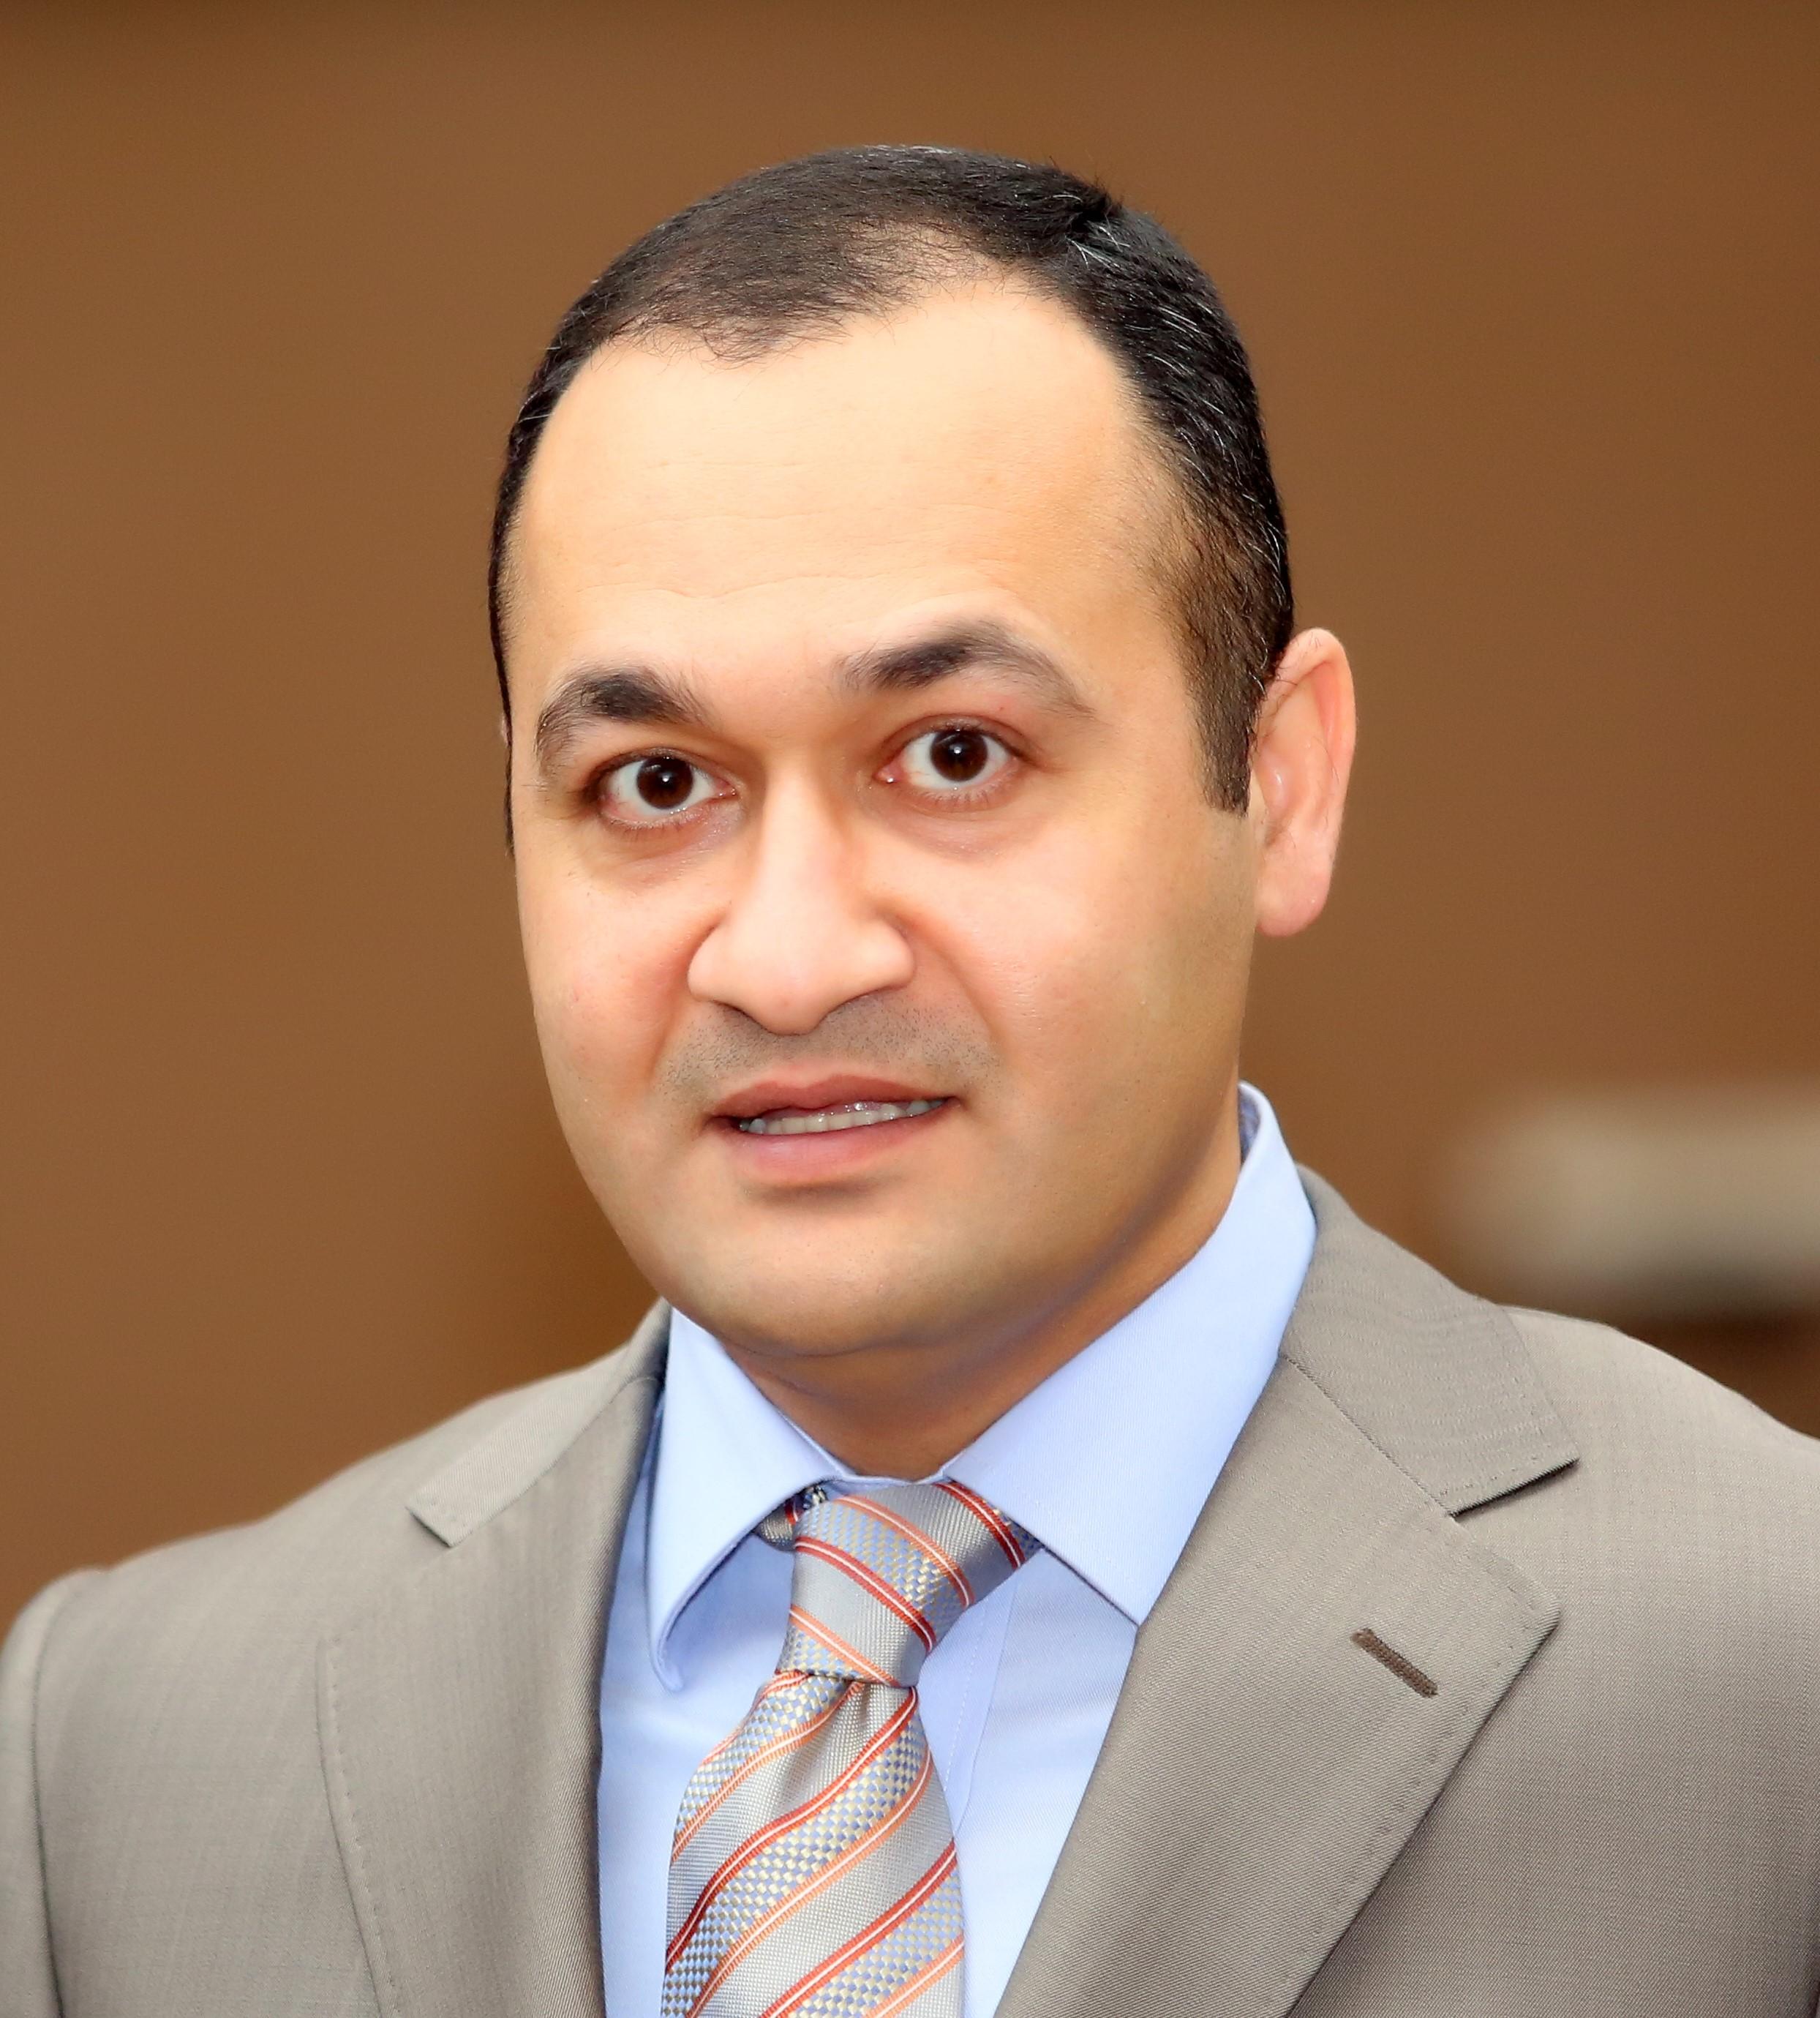 Atheer Jawad - Profile Photo.jpg